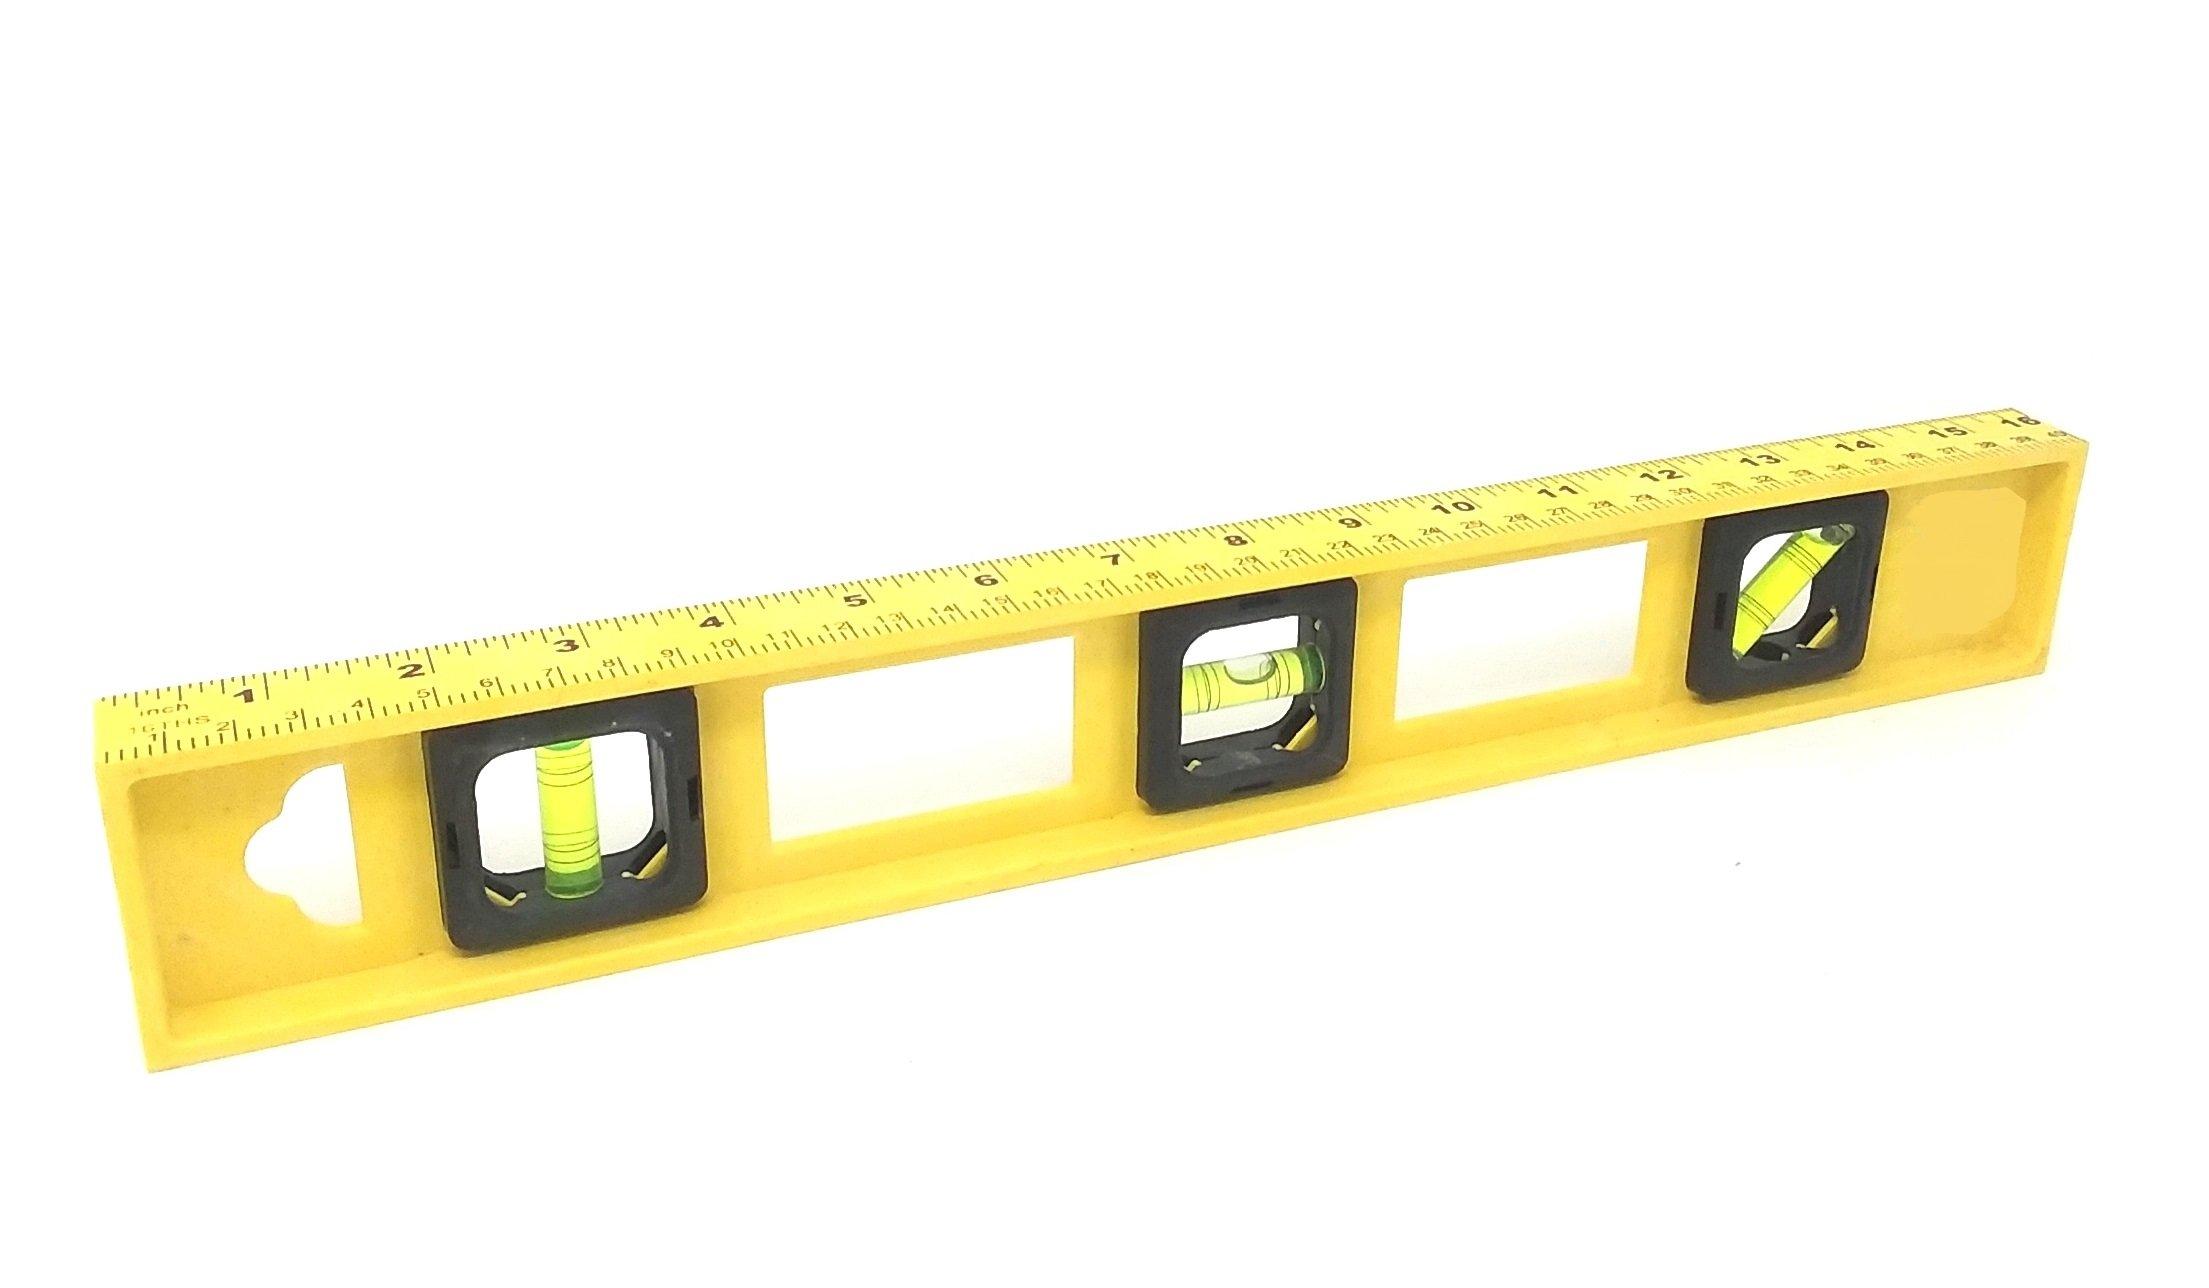 12 Yellow 16 Inch Torpedo Level With RULER 3 Vial Plastic WHOLESALE BULK LOT